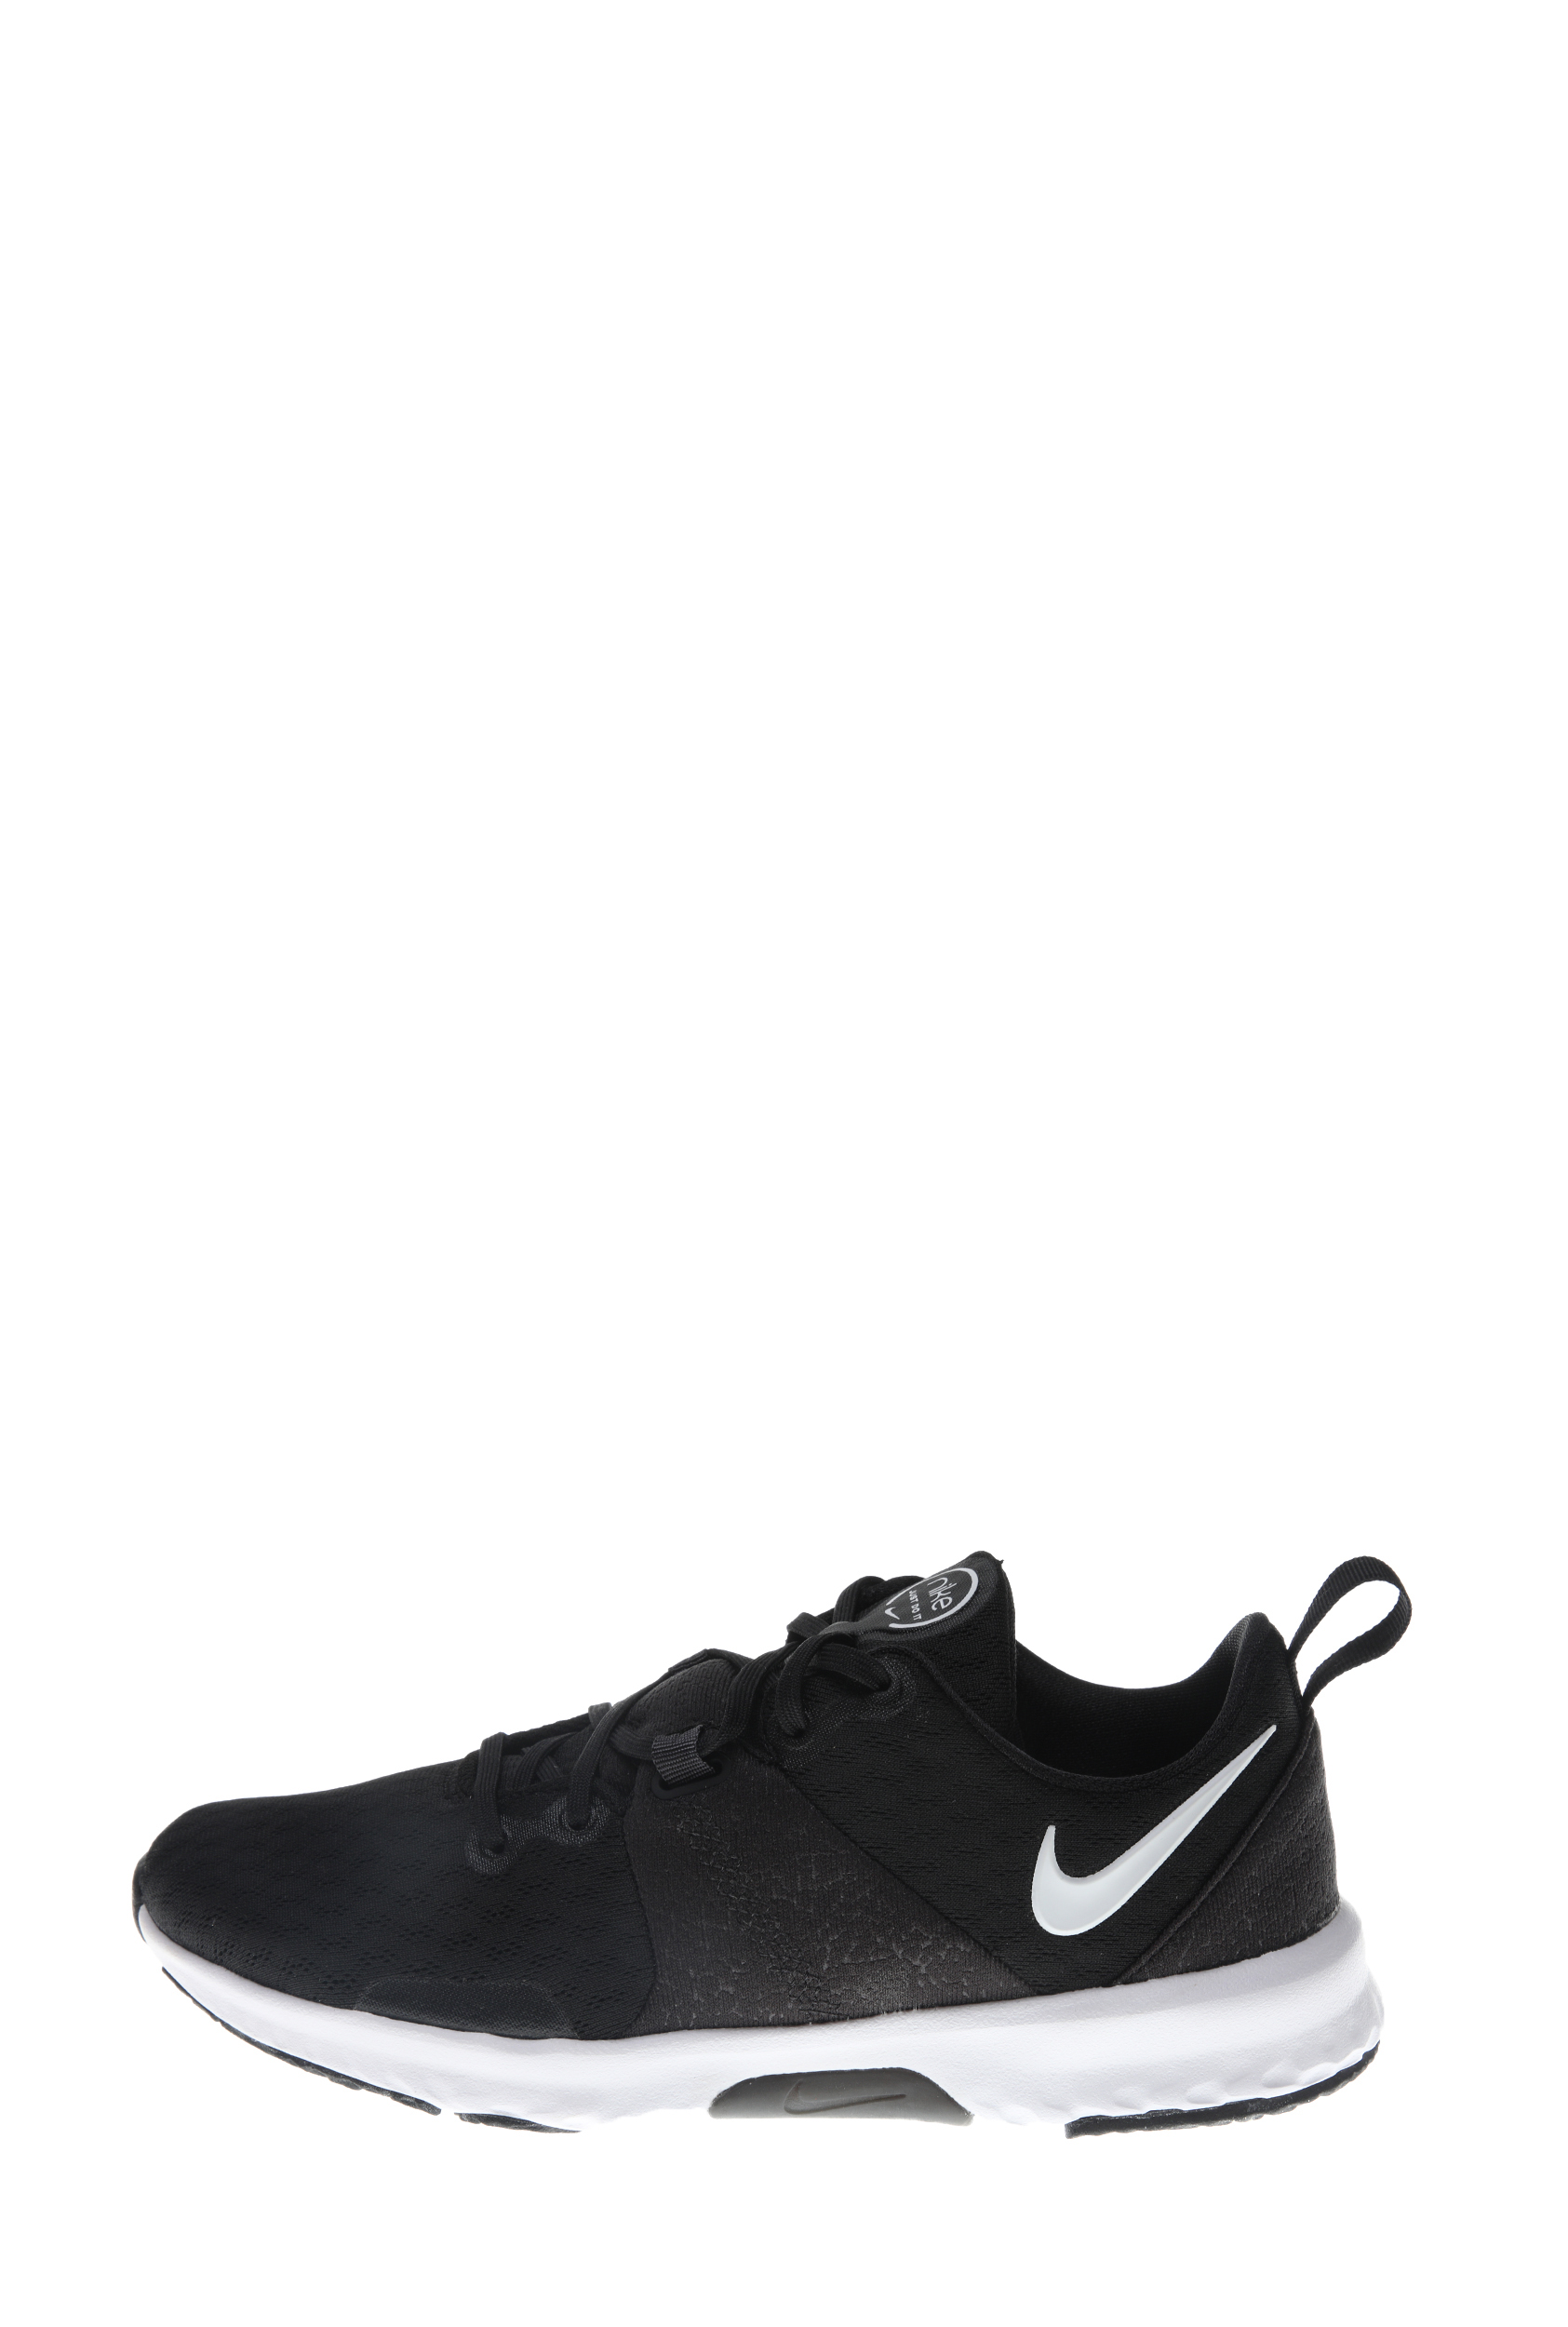 NIKE – Γυναικεία αθλητικά παπούτσια NIKE WMNS NIKE CITY TRAINER 3 μαύρα